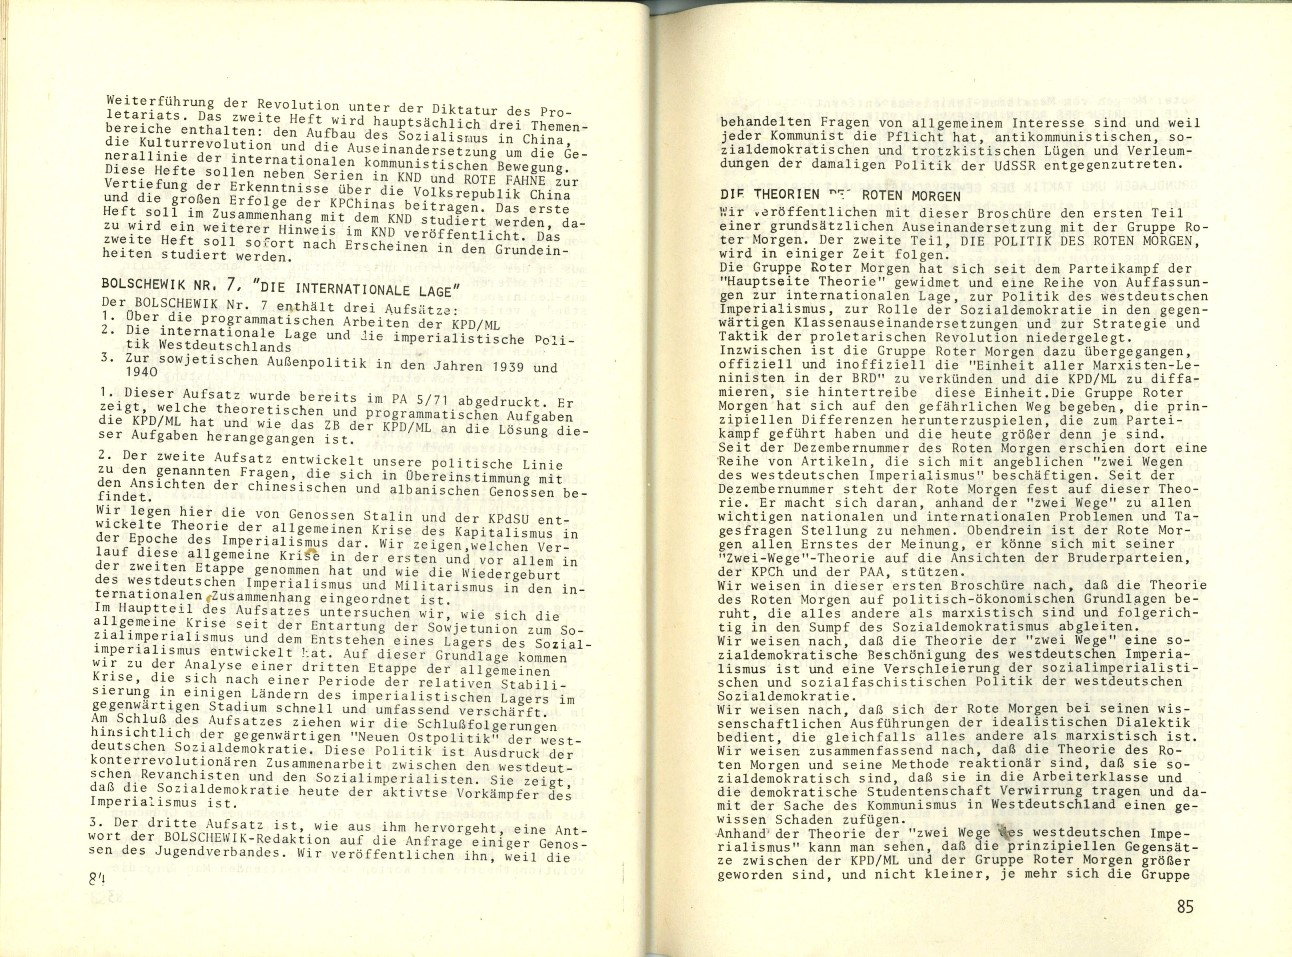 ZB_Parteiarbeiter_1971_06_44